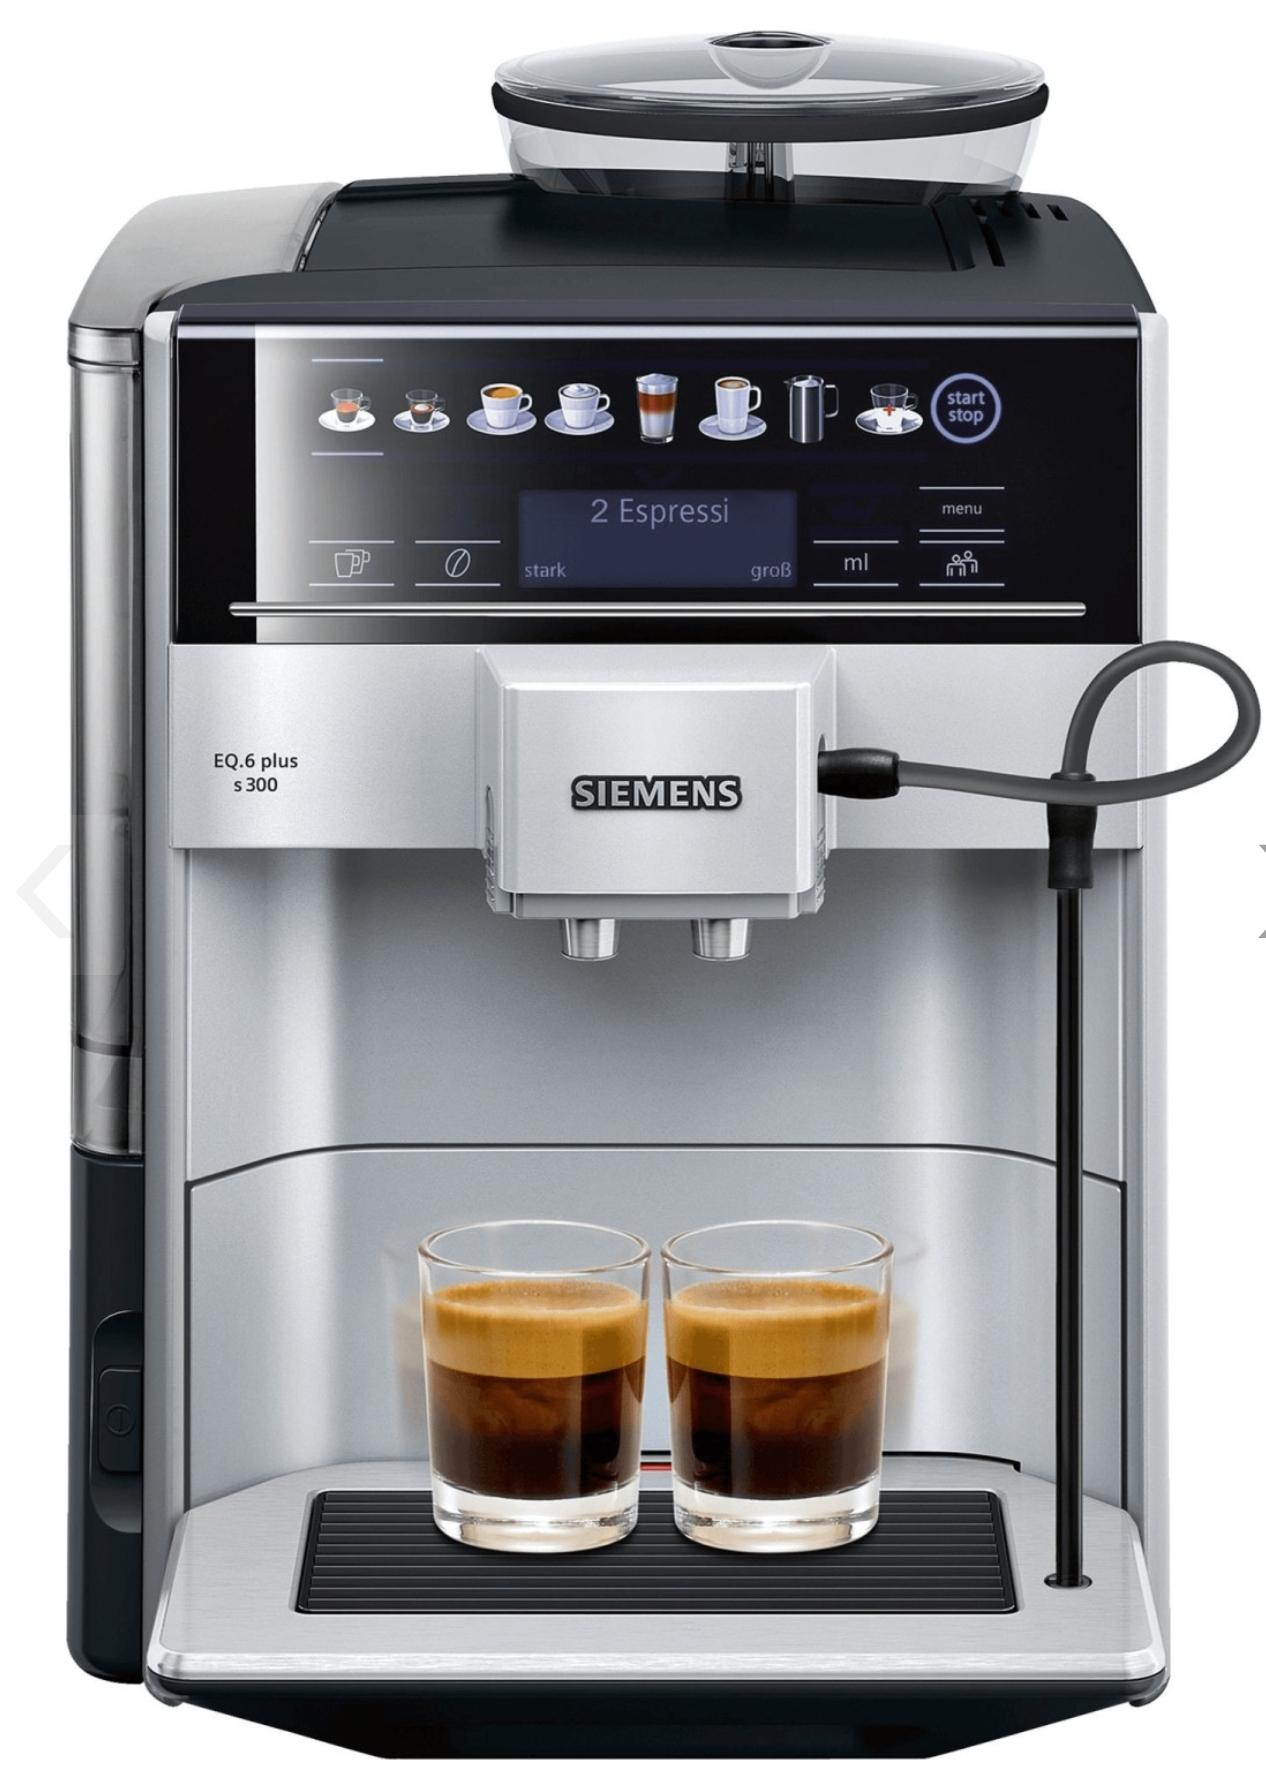 [Lokal: Nürnberg] Siemens Kaffeevollautomat EQ.6 plus s300 - TE653501DE